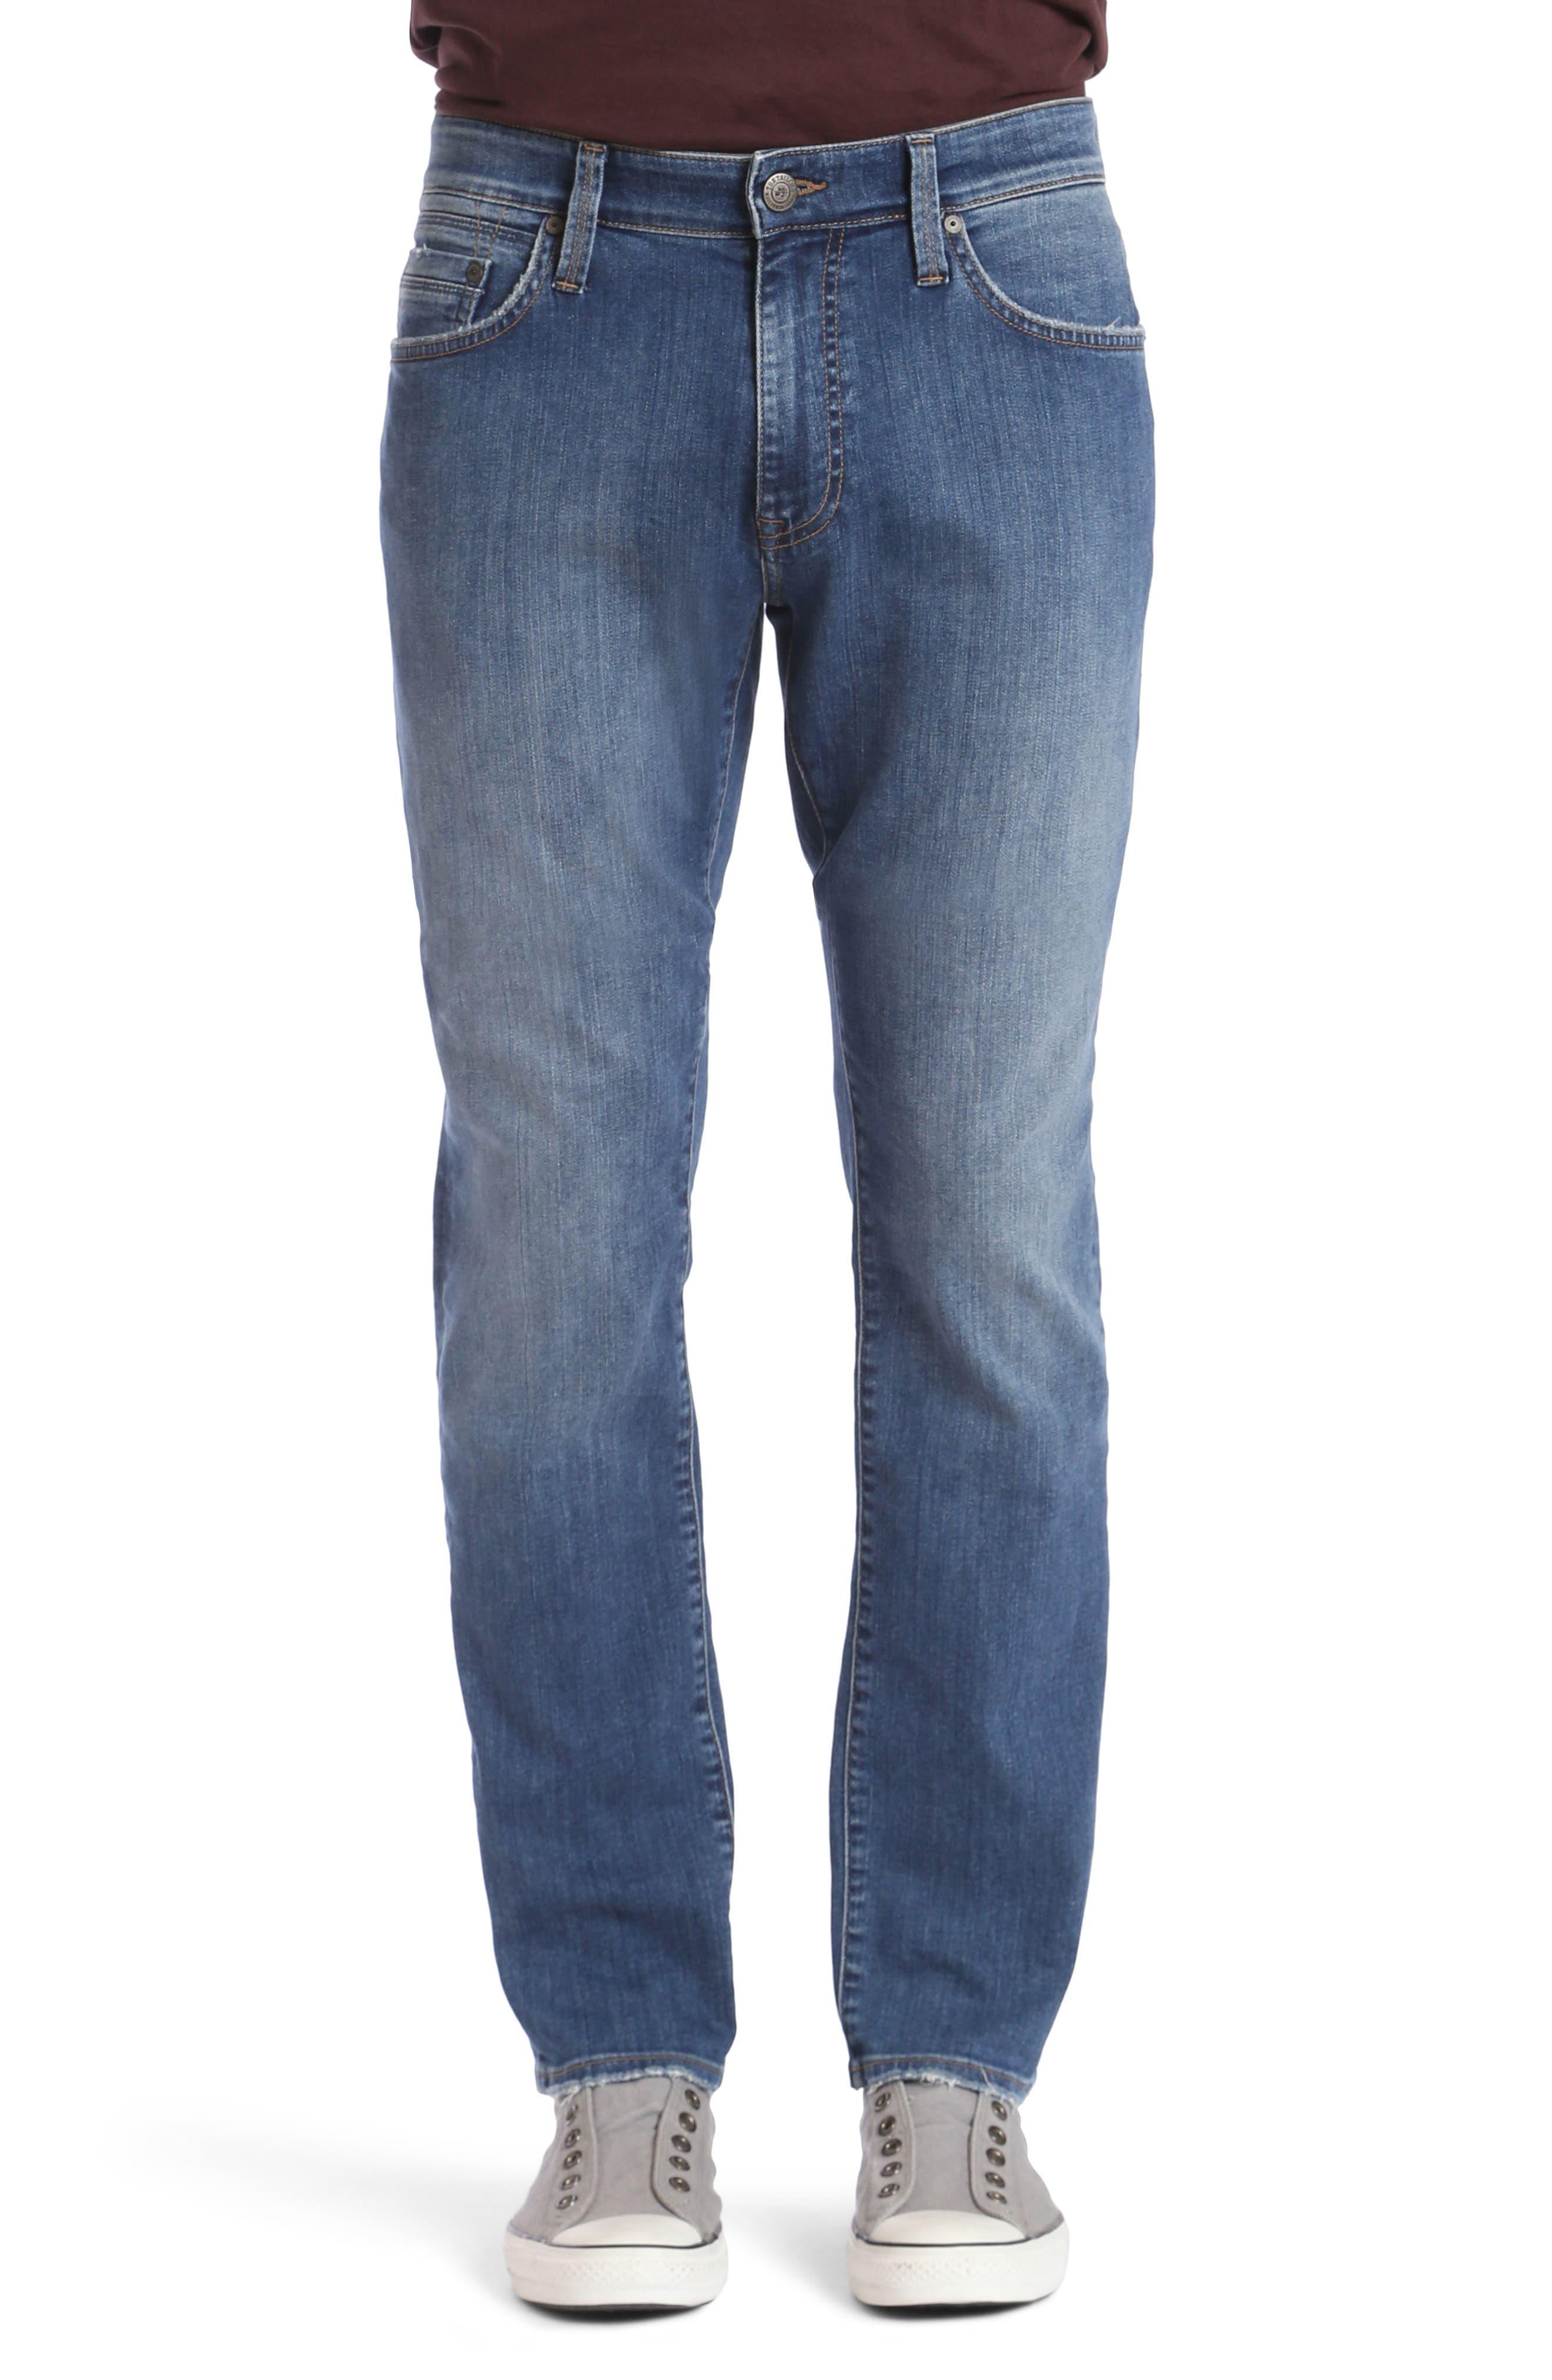 Main Image - Mavi Jeans Matt Relaxed Fit Jeans (Mid Clean Comfort)